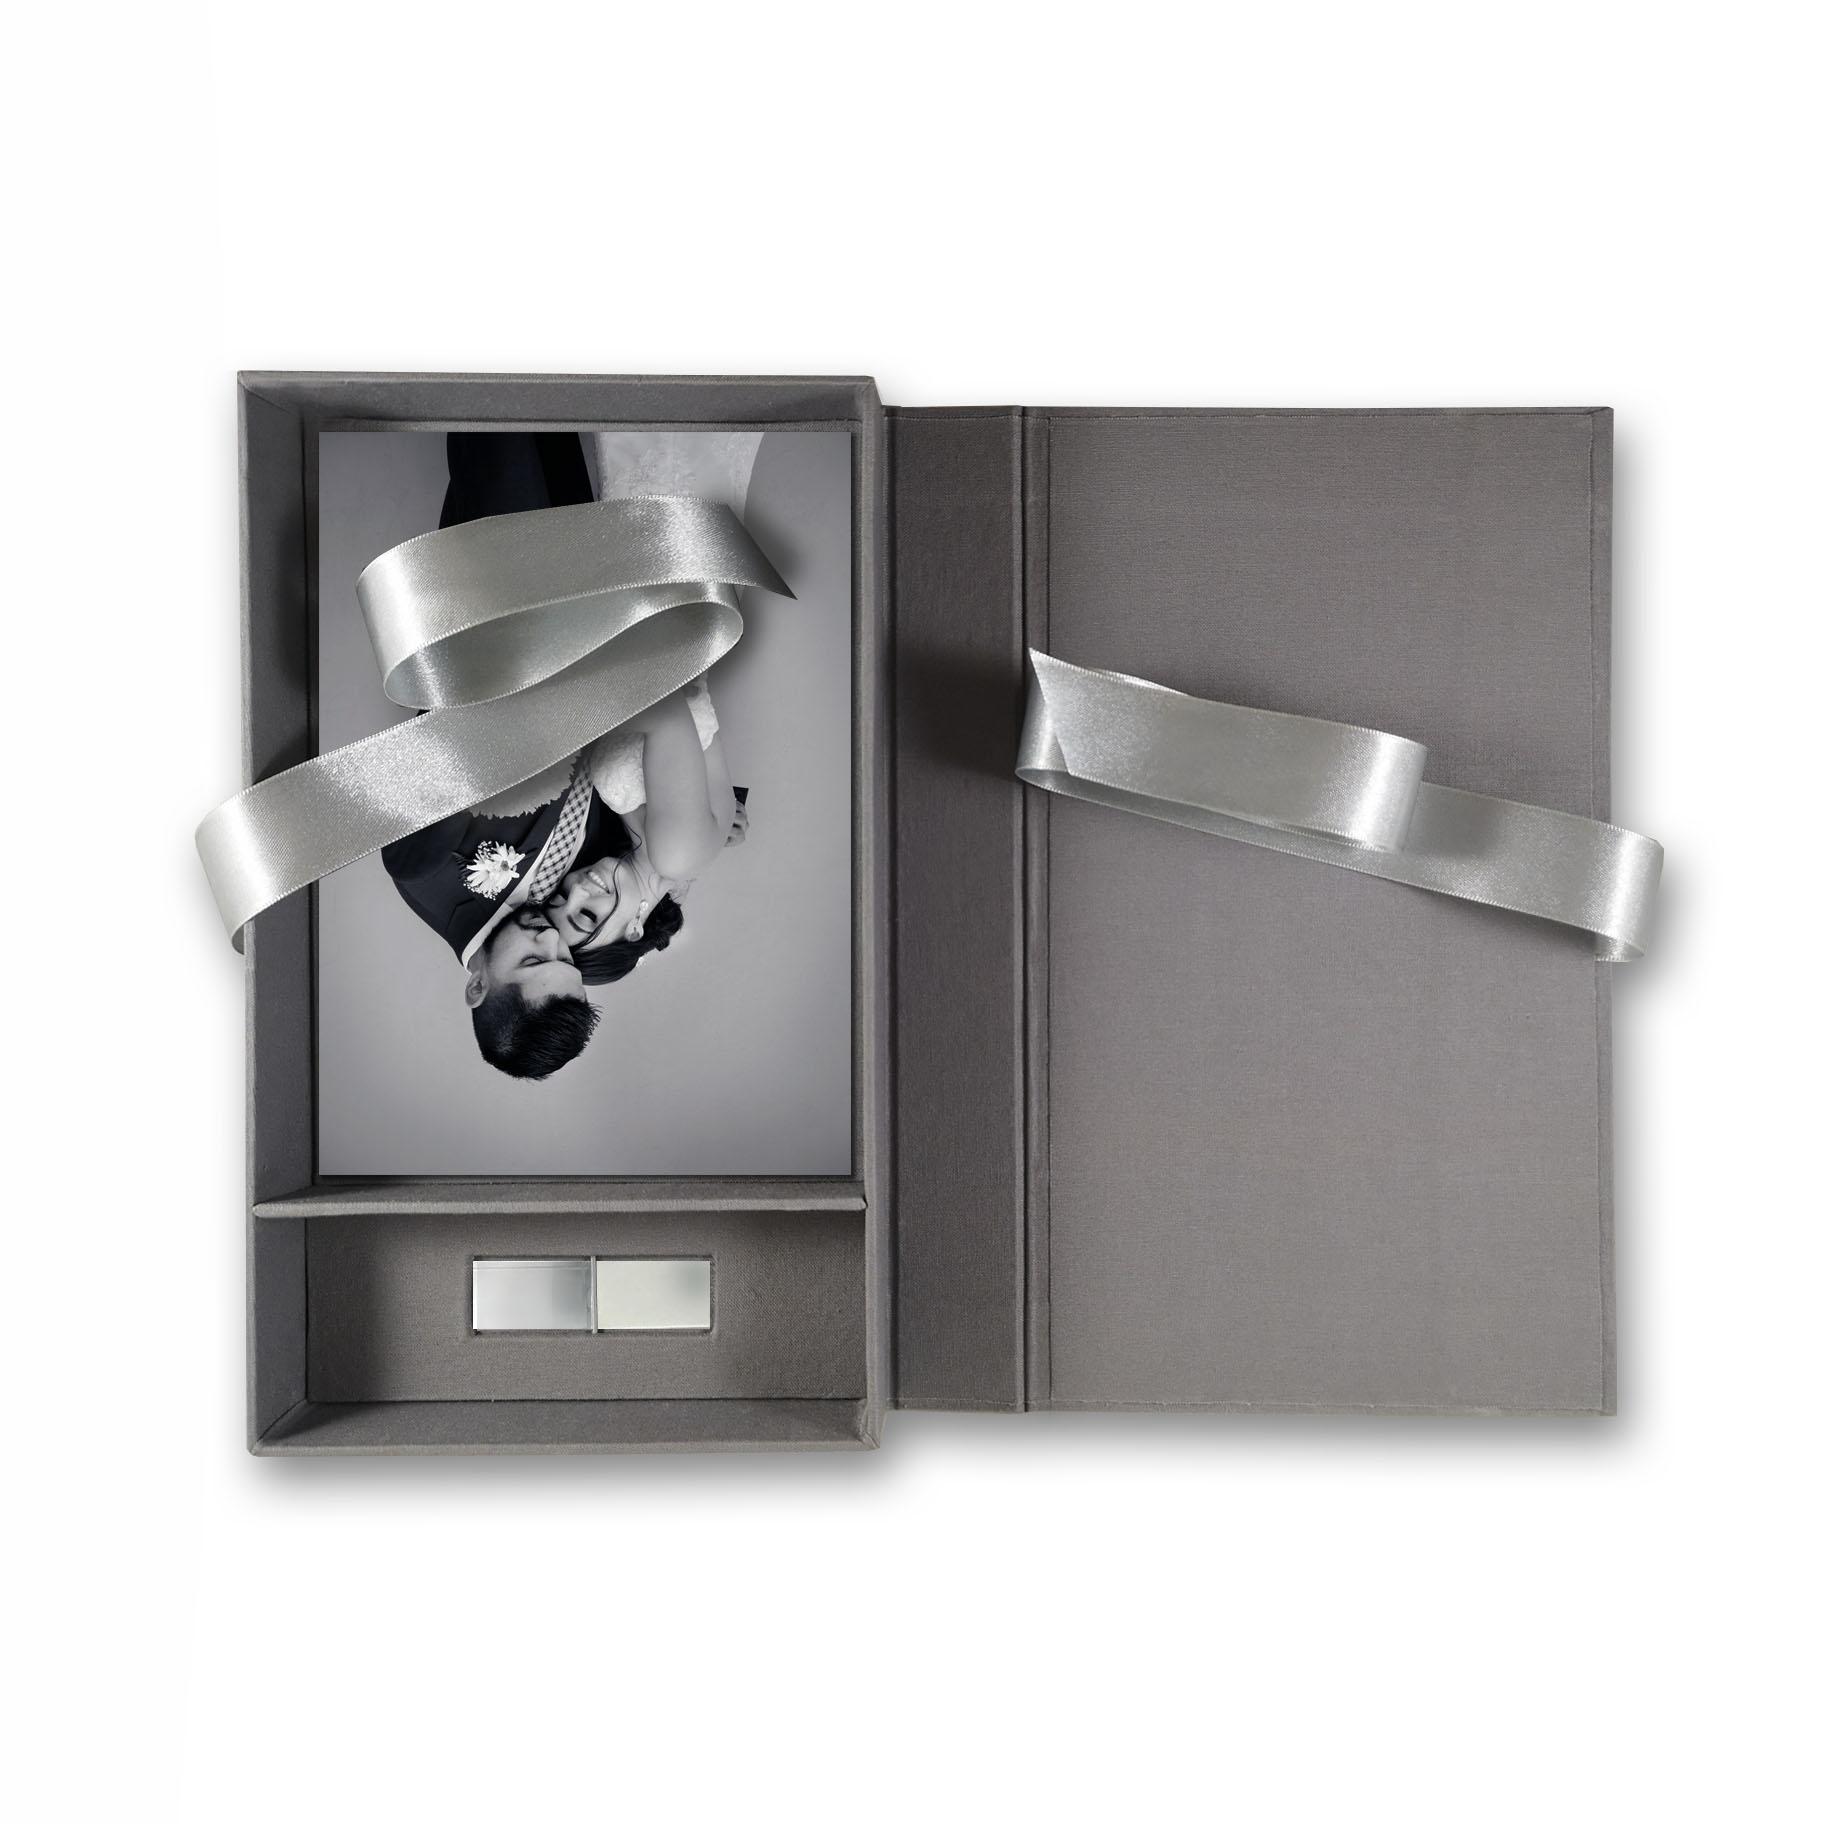 Linen USB stick box for photographer